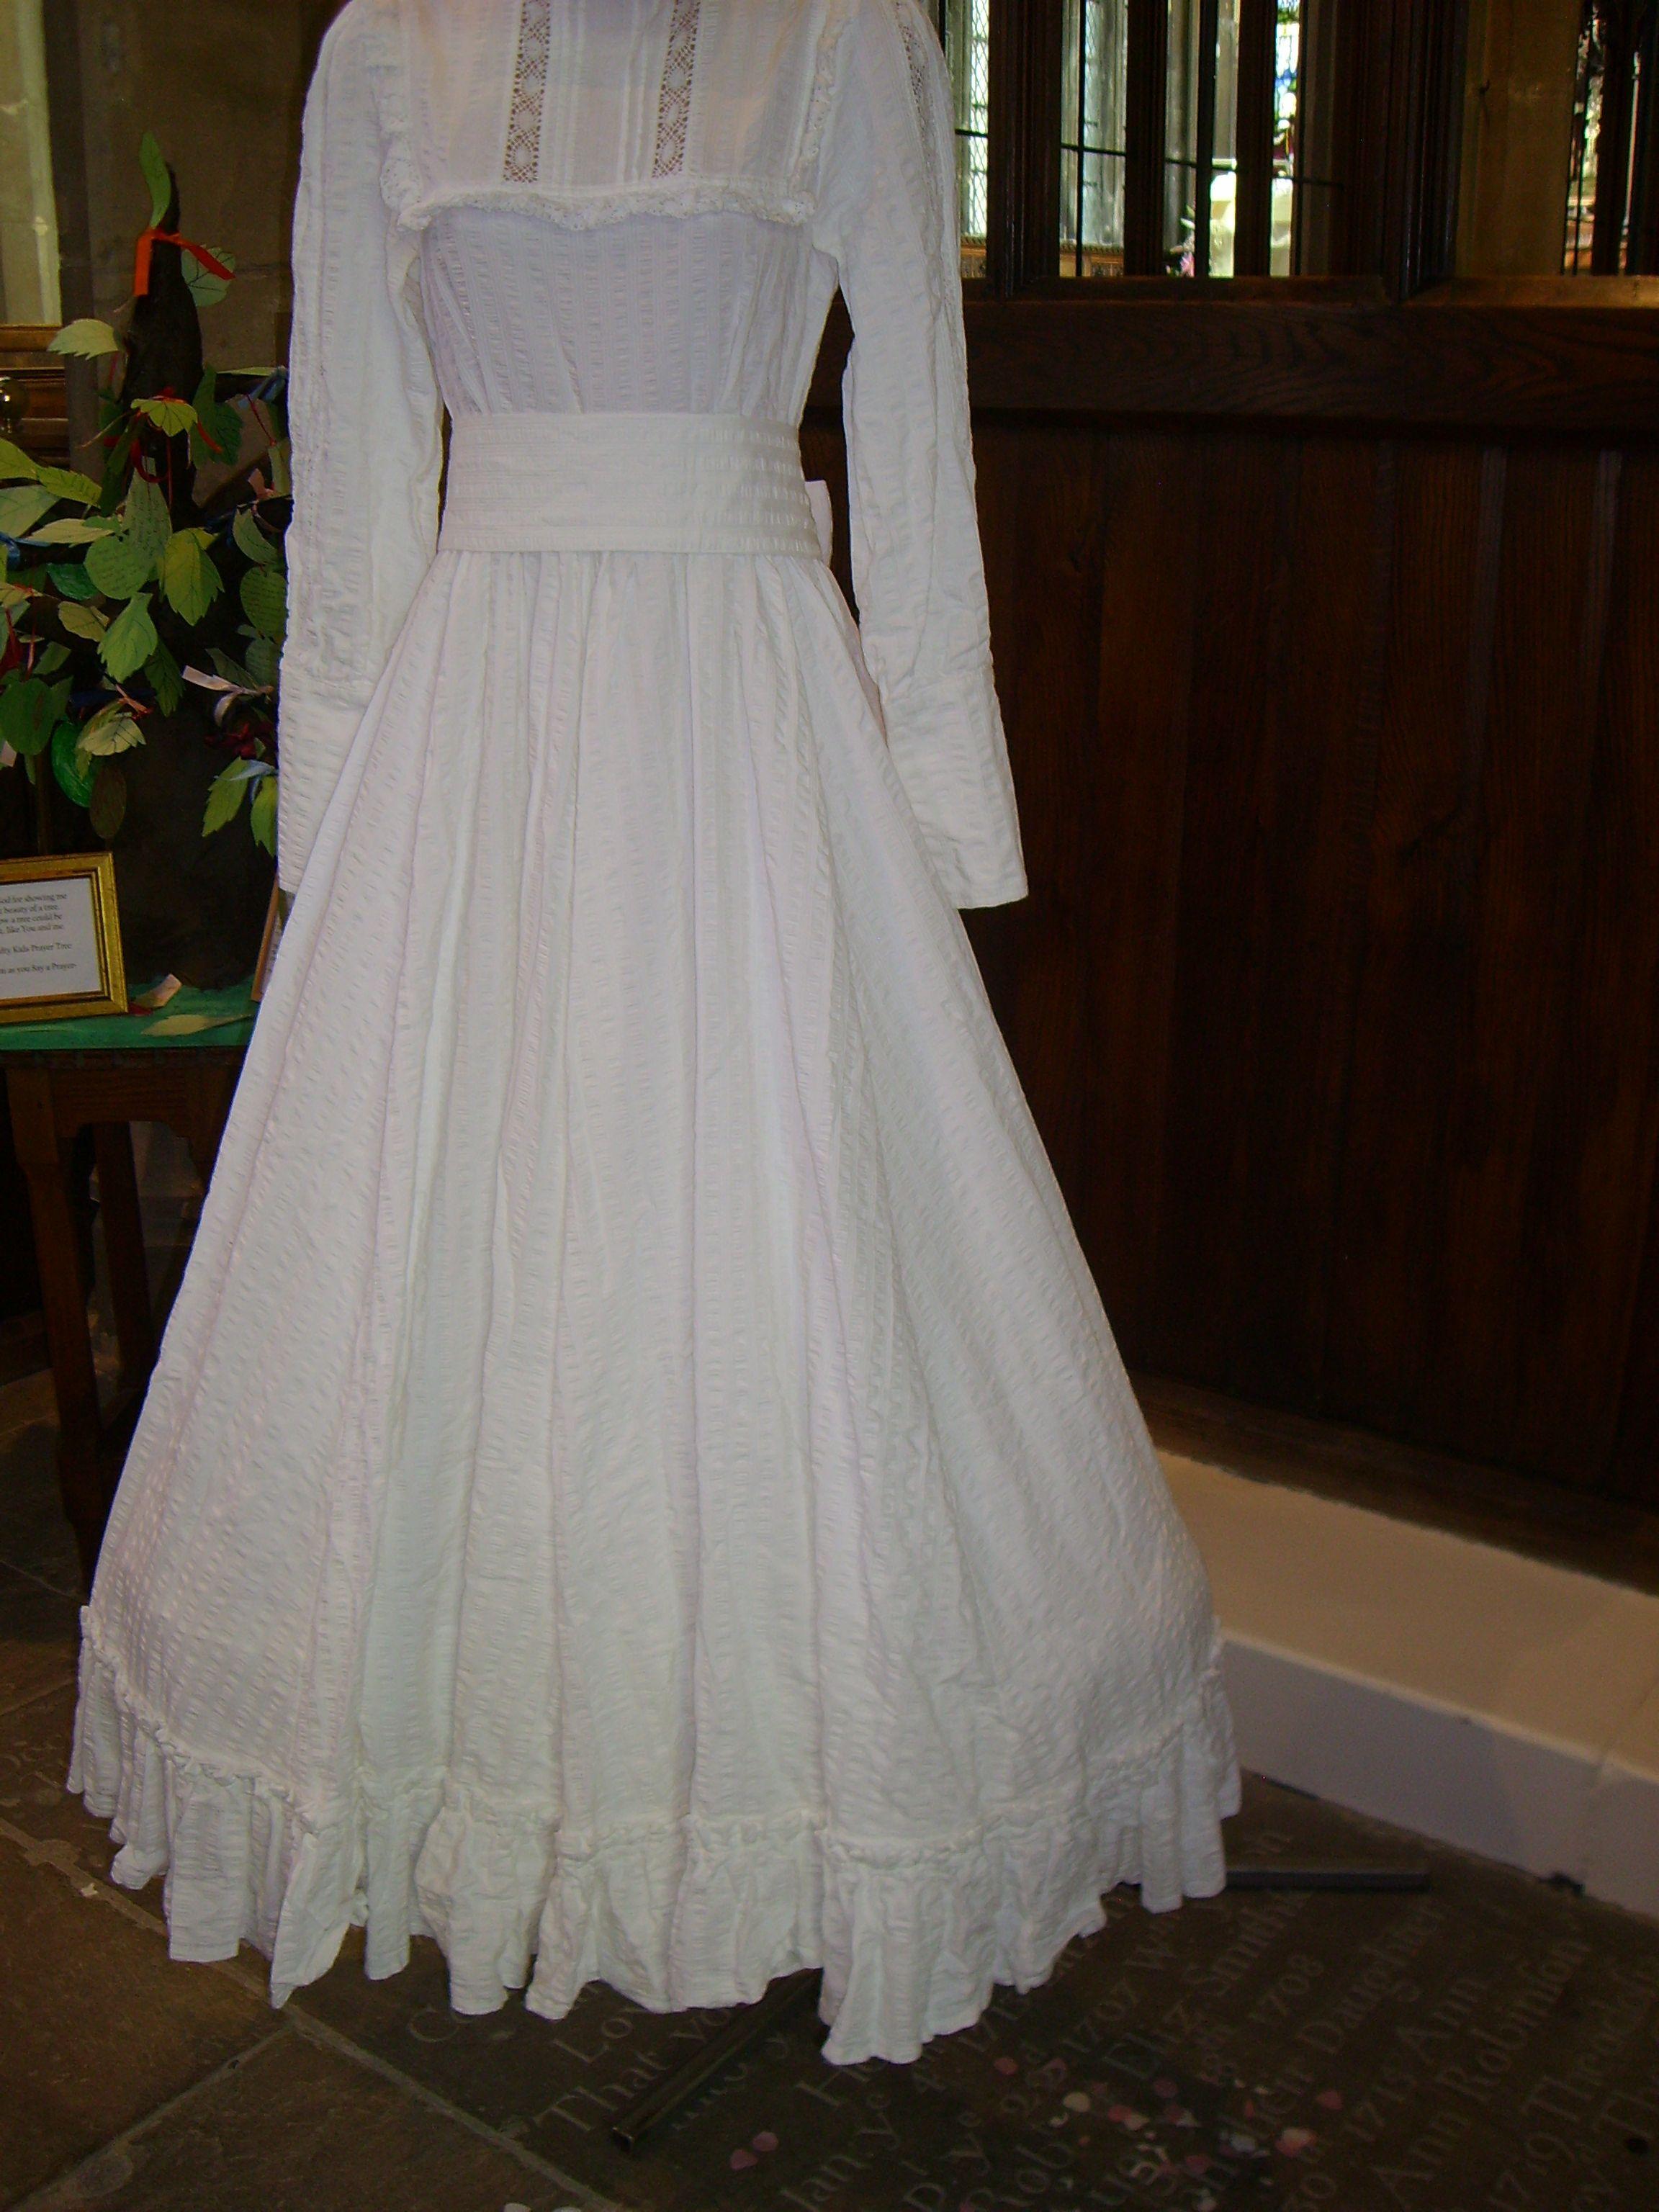 laura ashley wedding dresses Wedding Dresses through the Ages